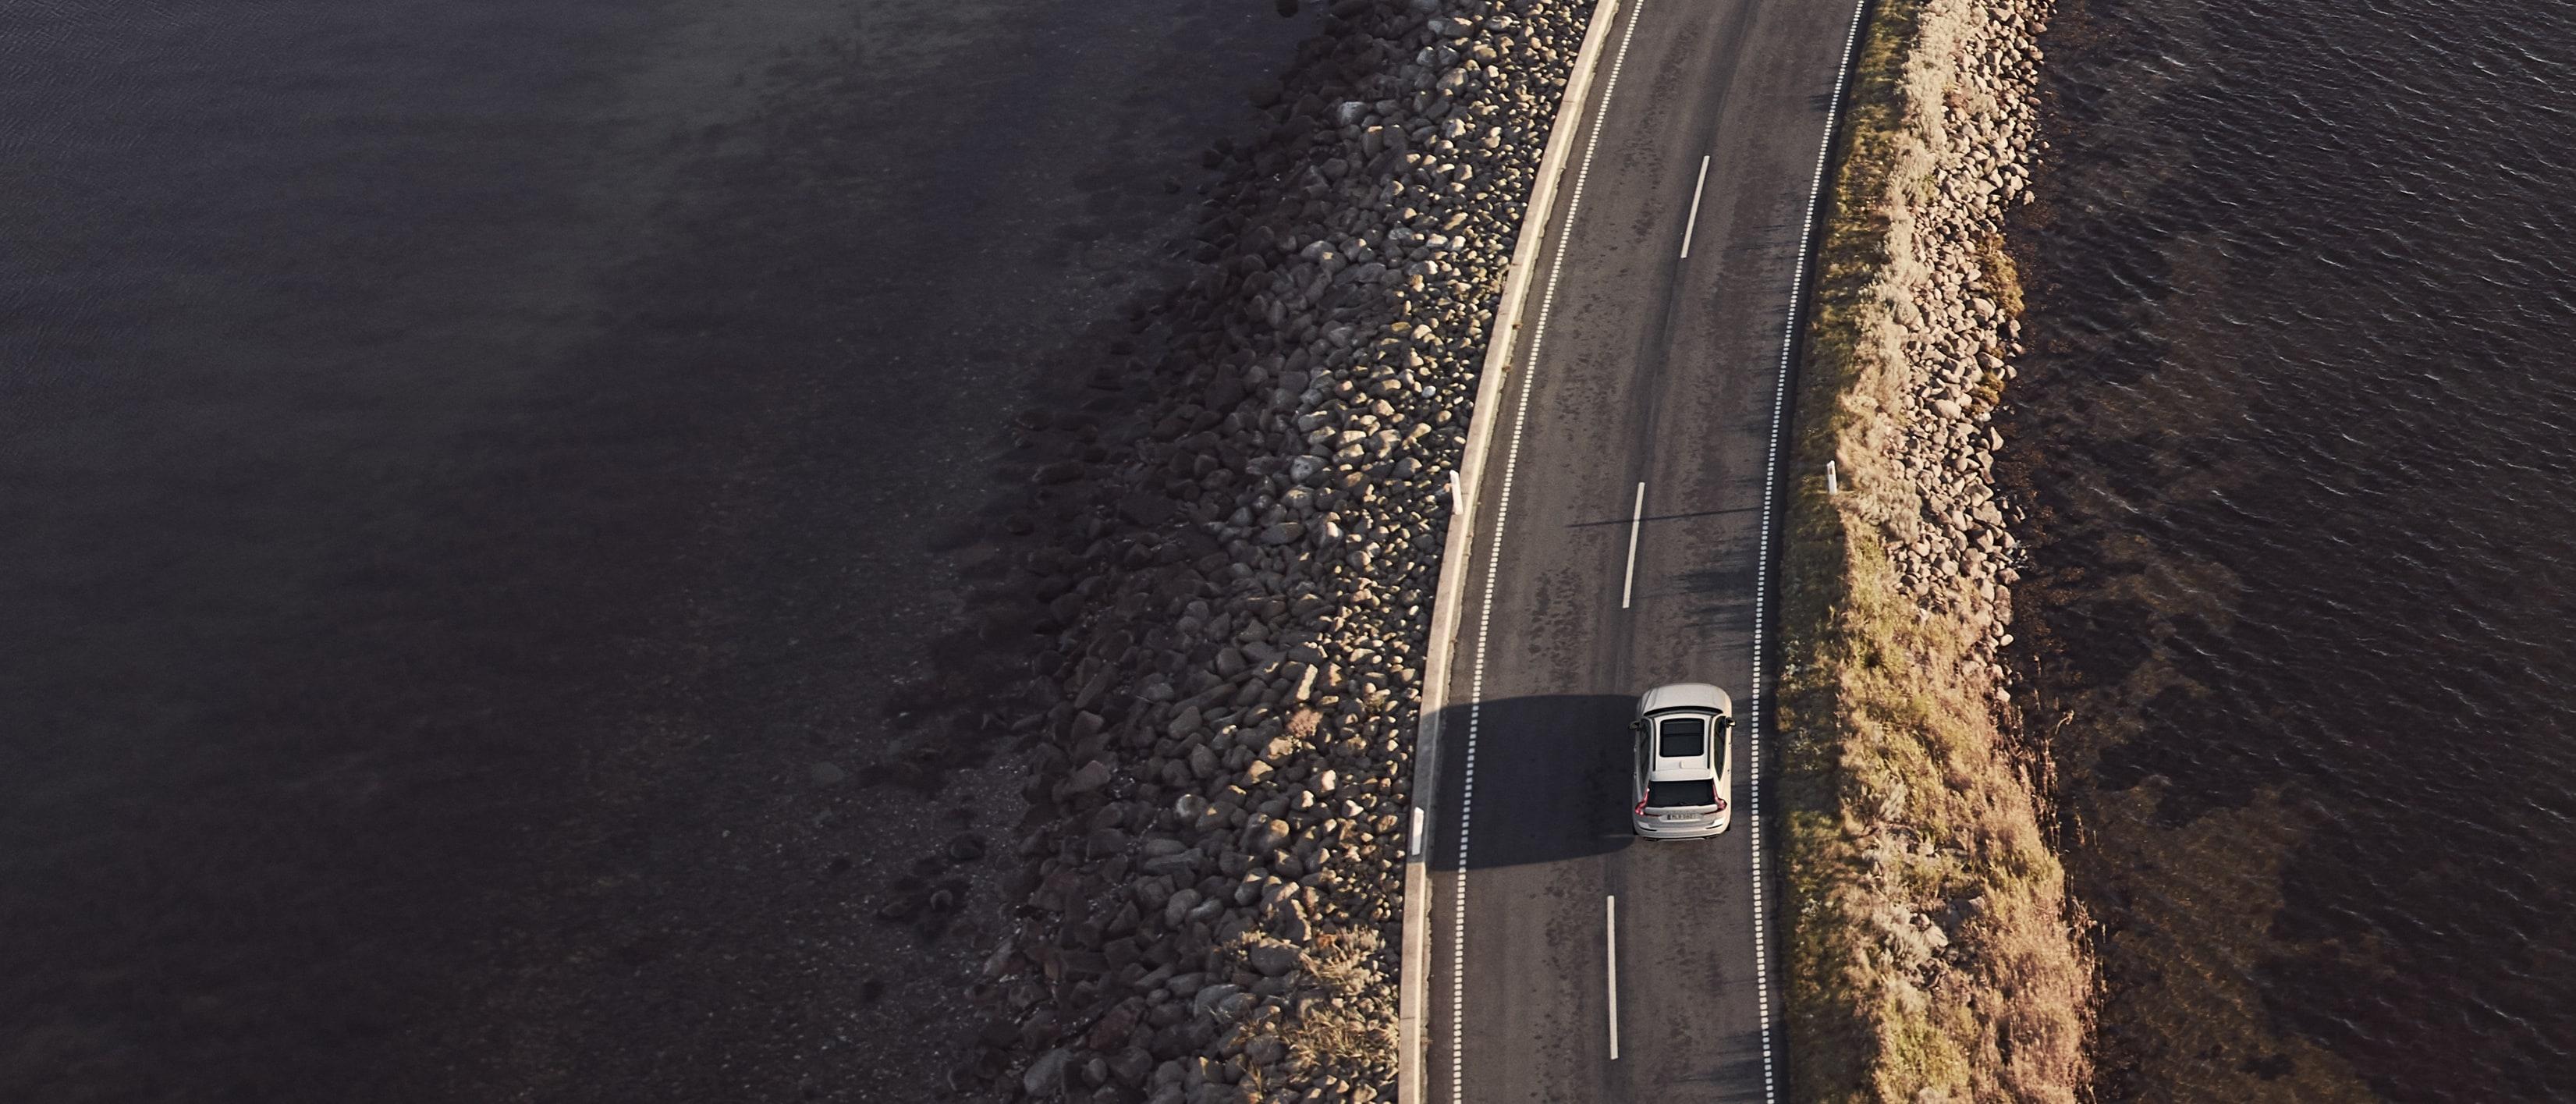 Noleggio V90 con Care by Volvo